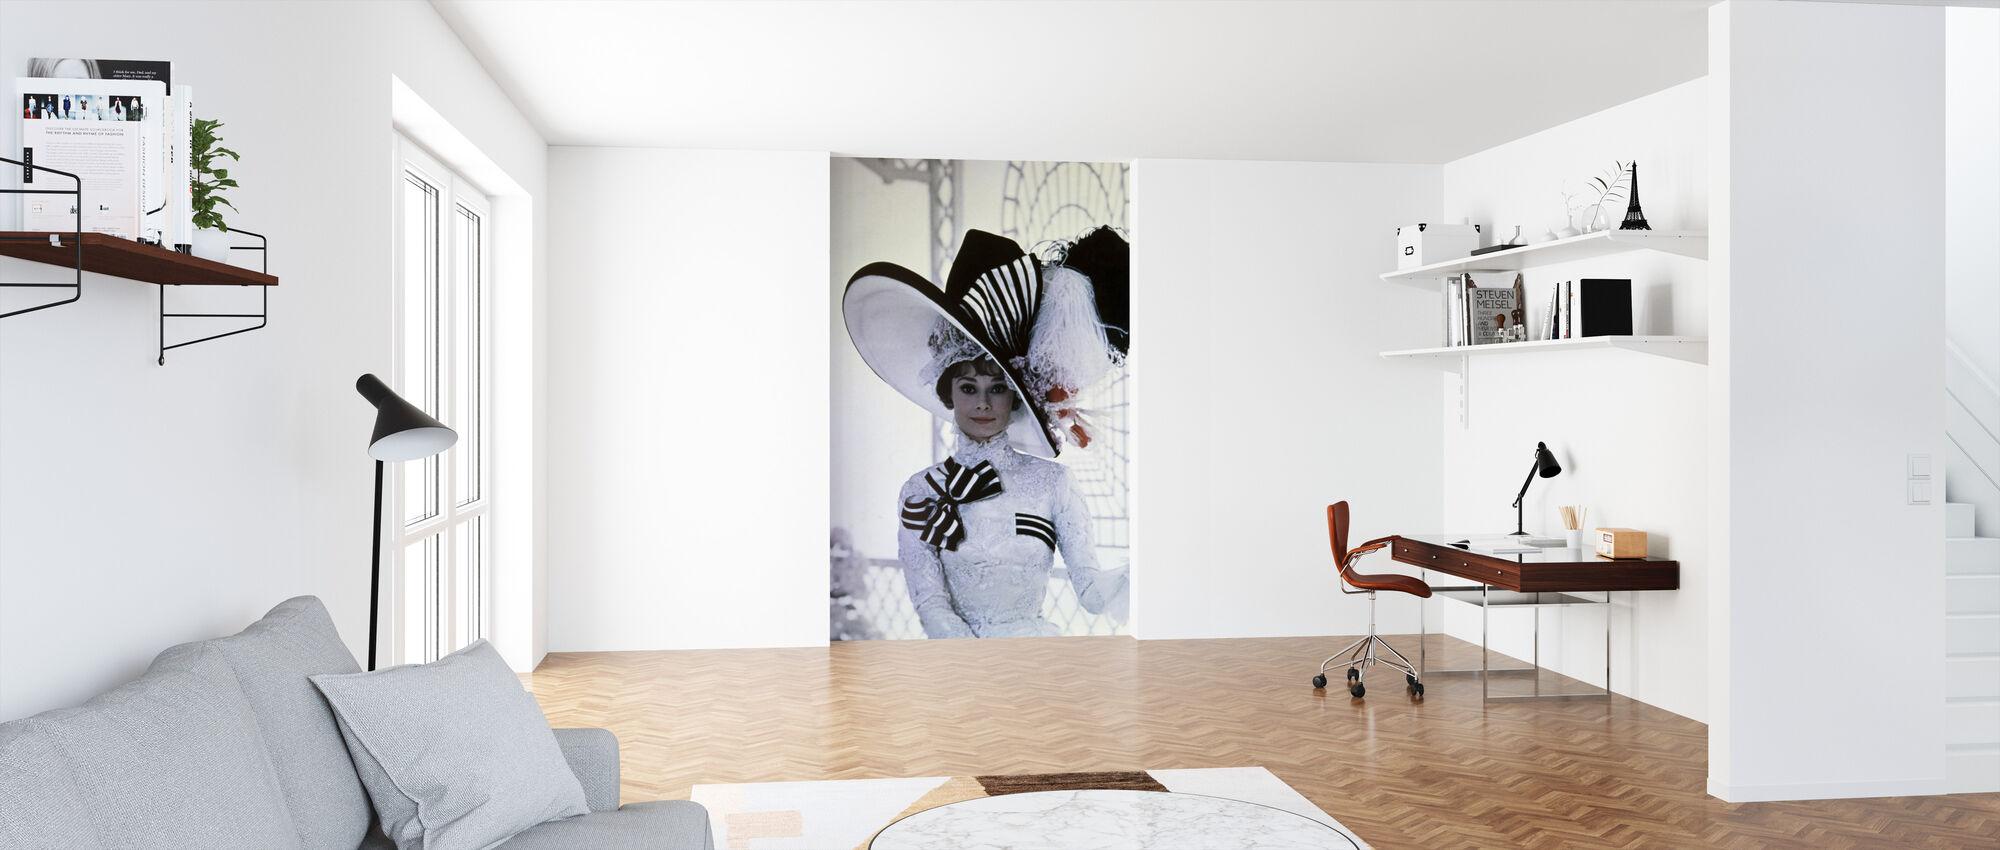 Min Fair Lady - Audrey Hepburn - Tapet - Kontor